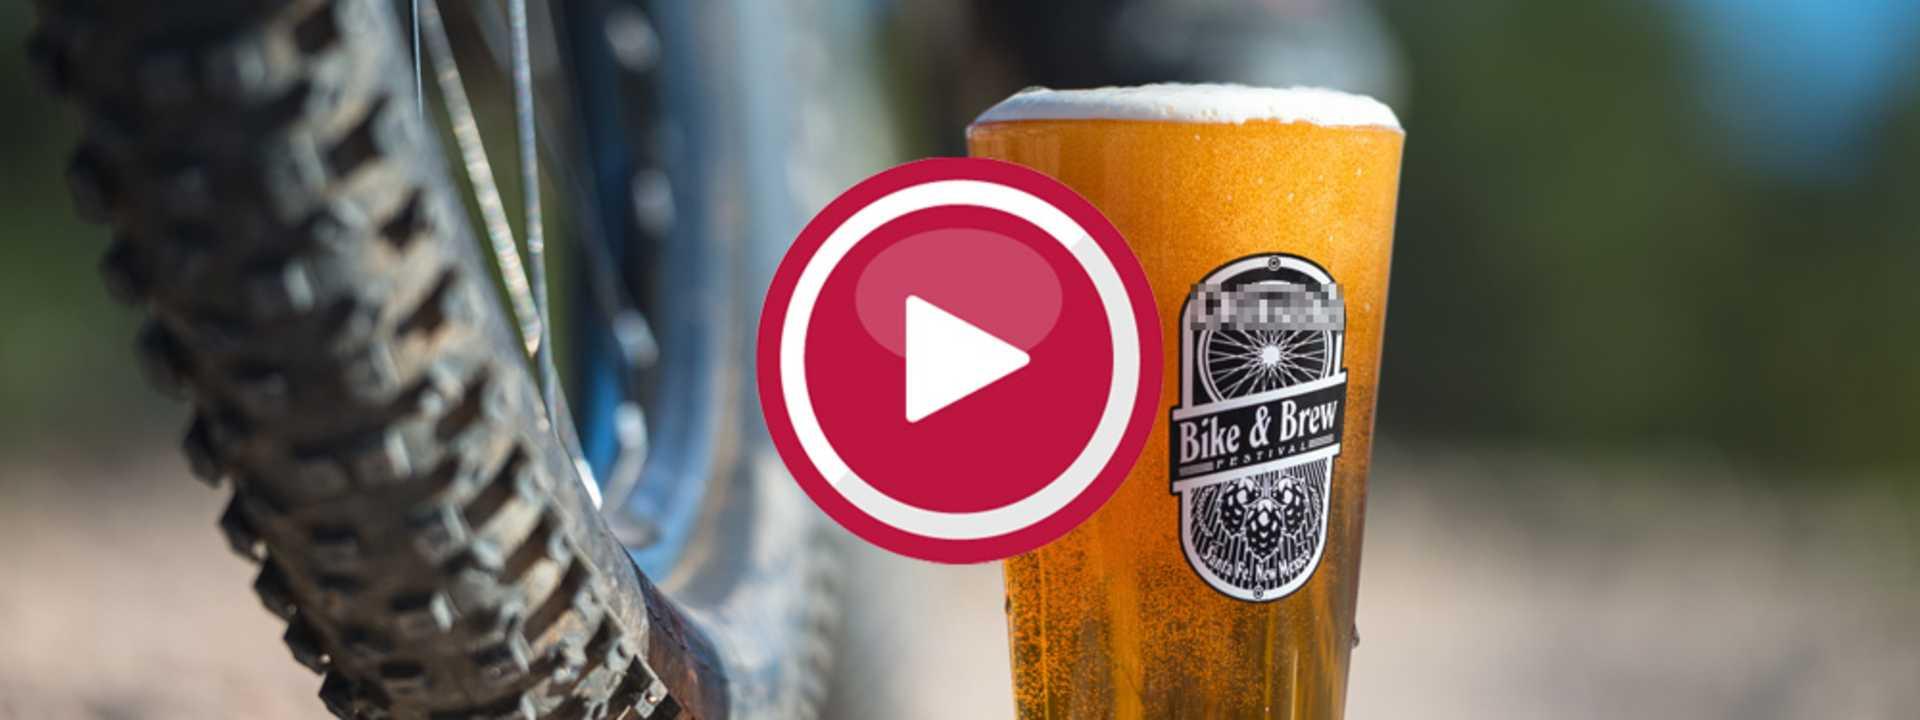 NM True TV - Bike & Brew Tour